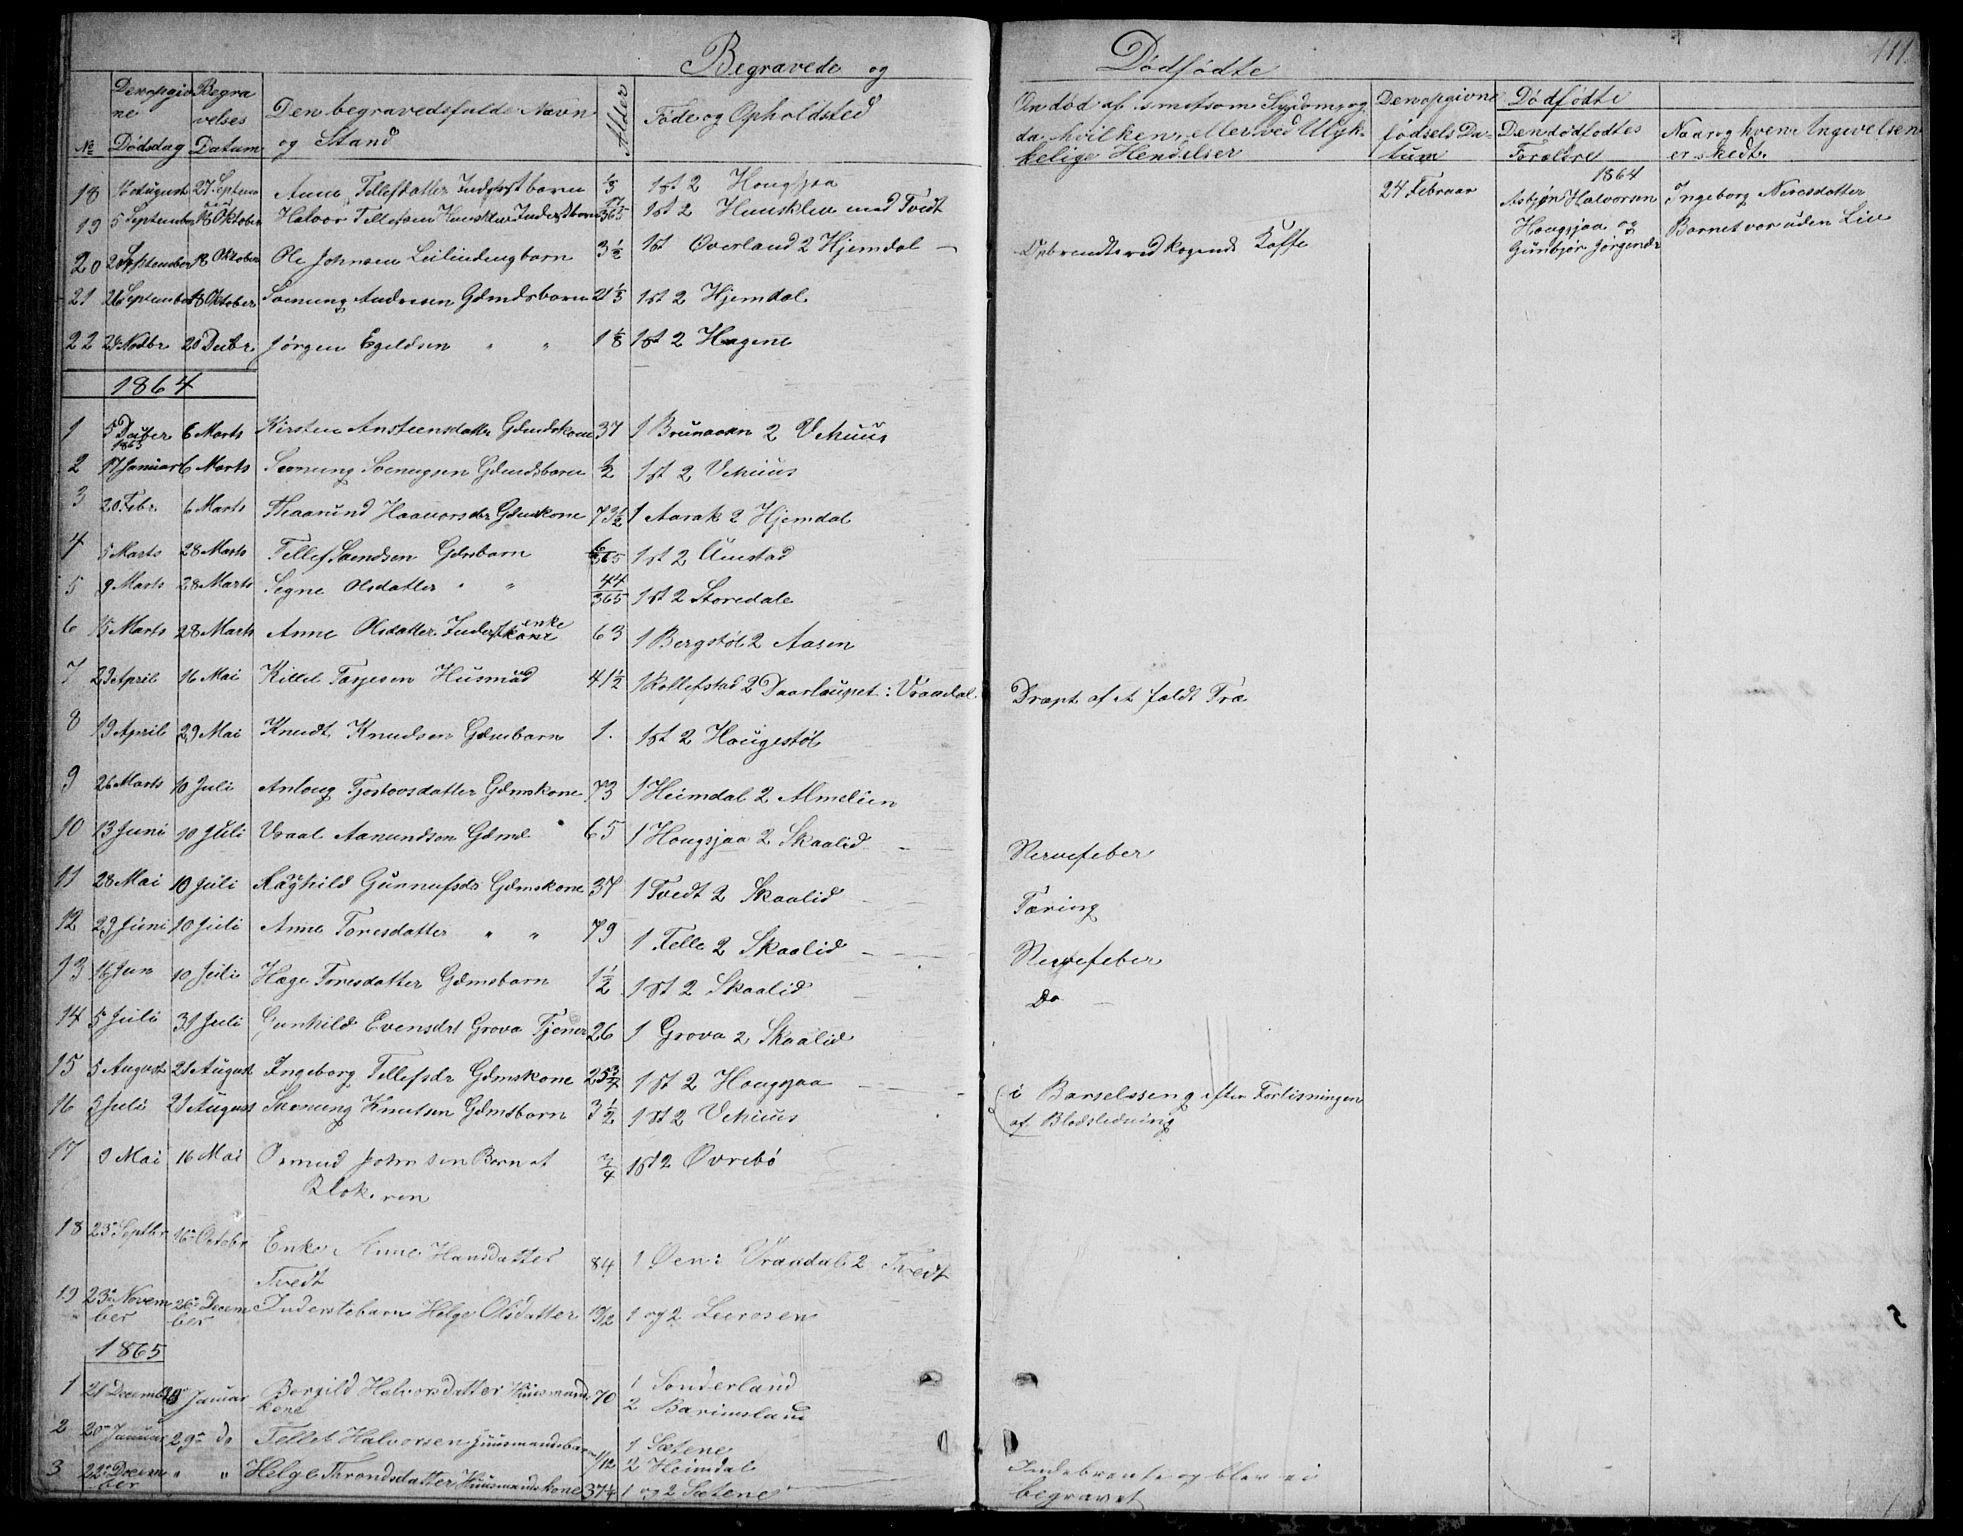 SAKO, Nissedal kirkebøker, G/Gb/L0002: Klokkerbok nr. II 2, 1863-1892, s. 111